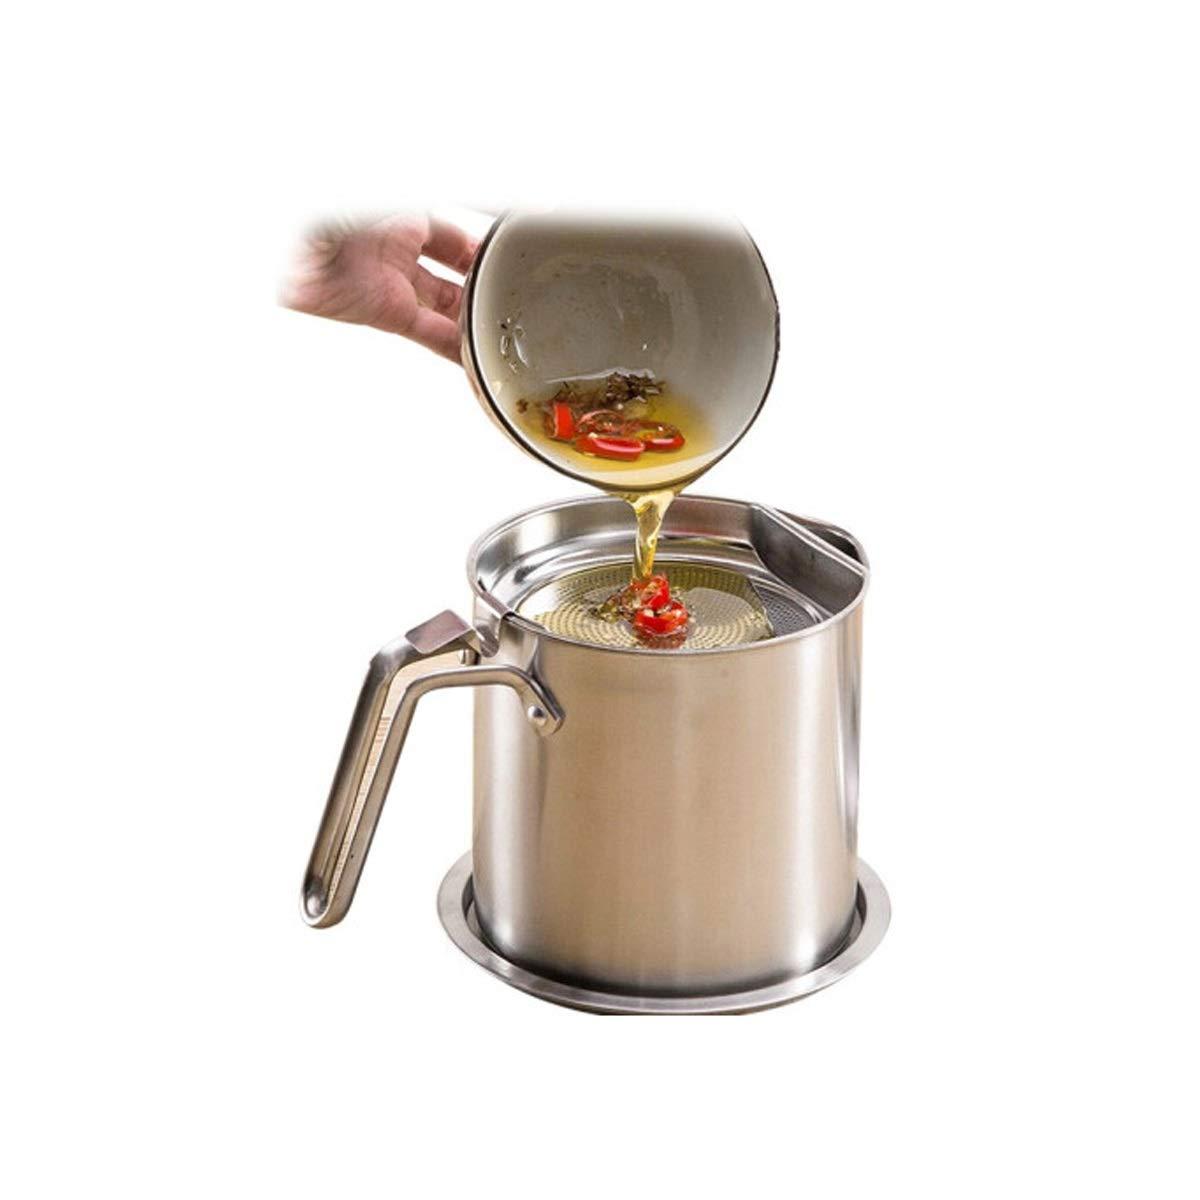 QINRUIKUANGSHAN 304 stainless steel oil pot glass filter bottle soy sauce bottle kitchen supplies leakproof large storage tank oil filter (Color : Silver) by QINRUIKUANGSHAN